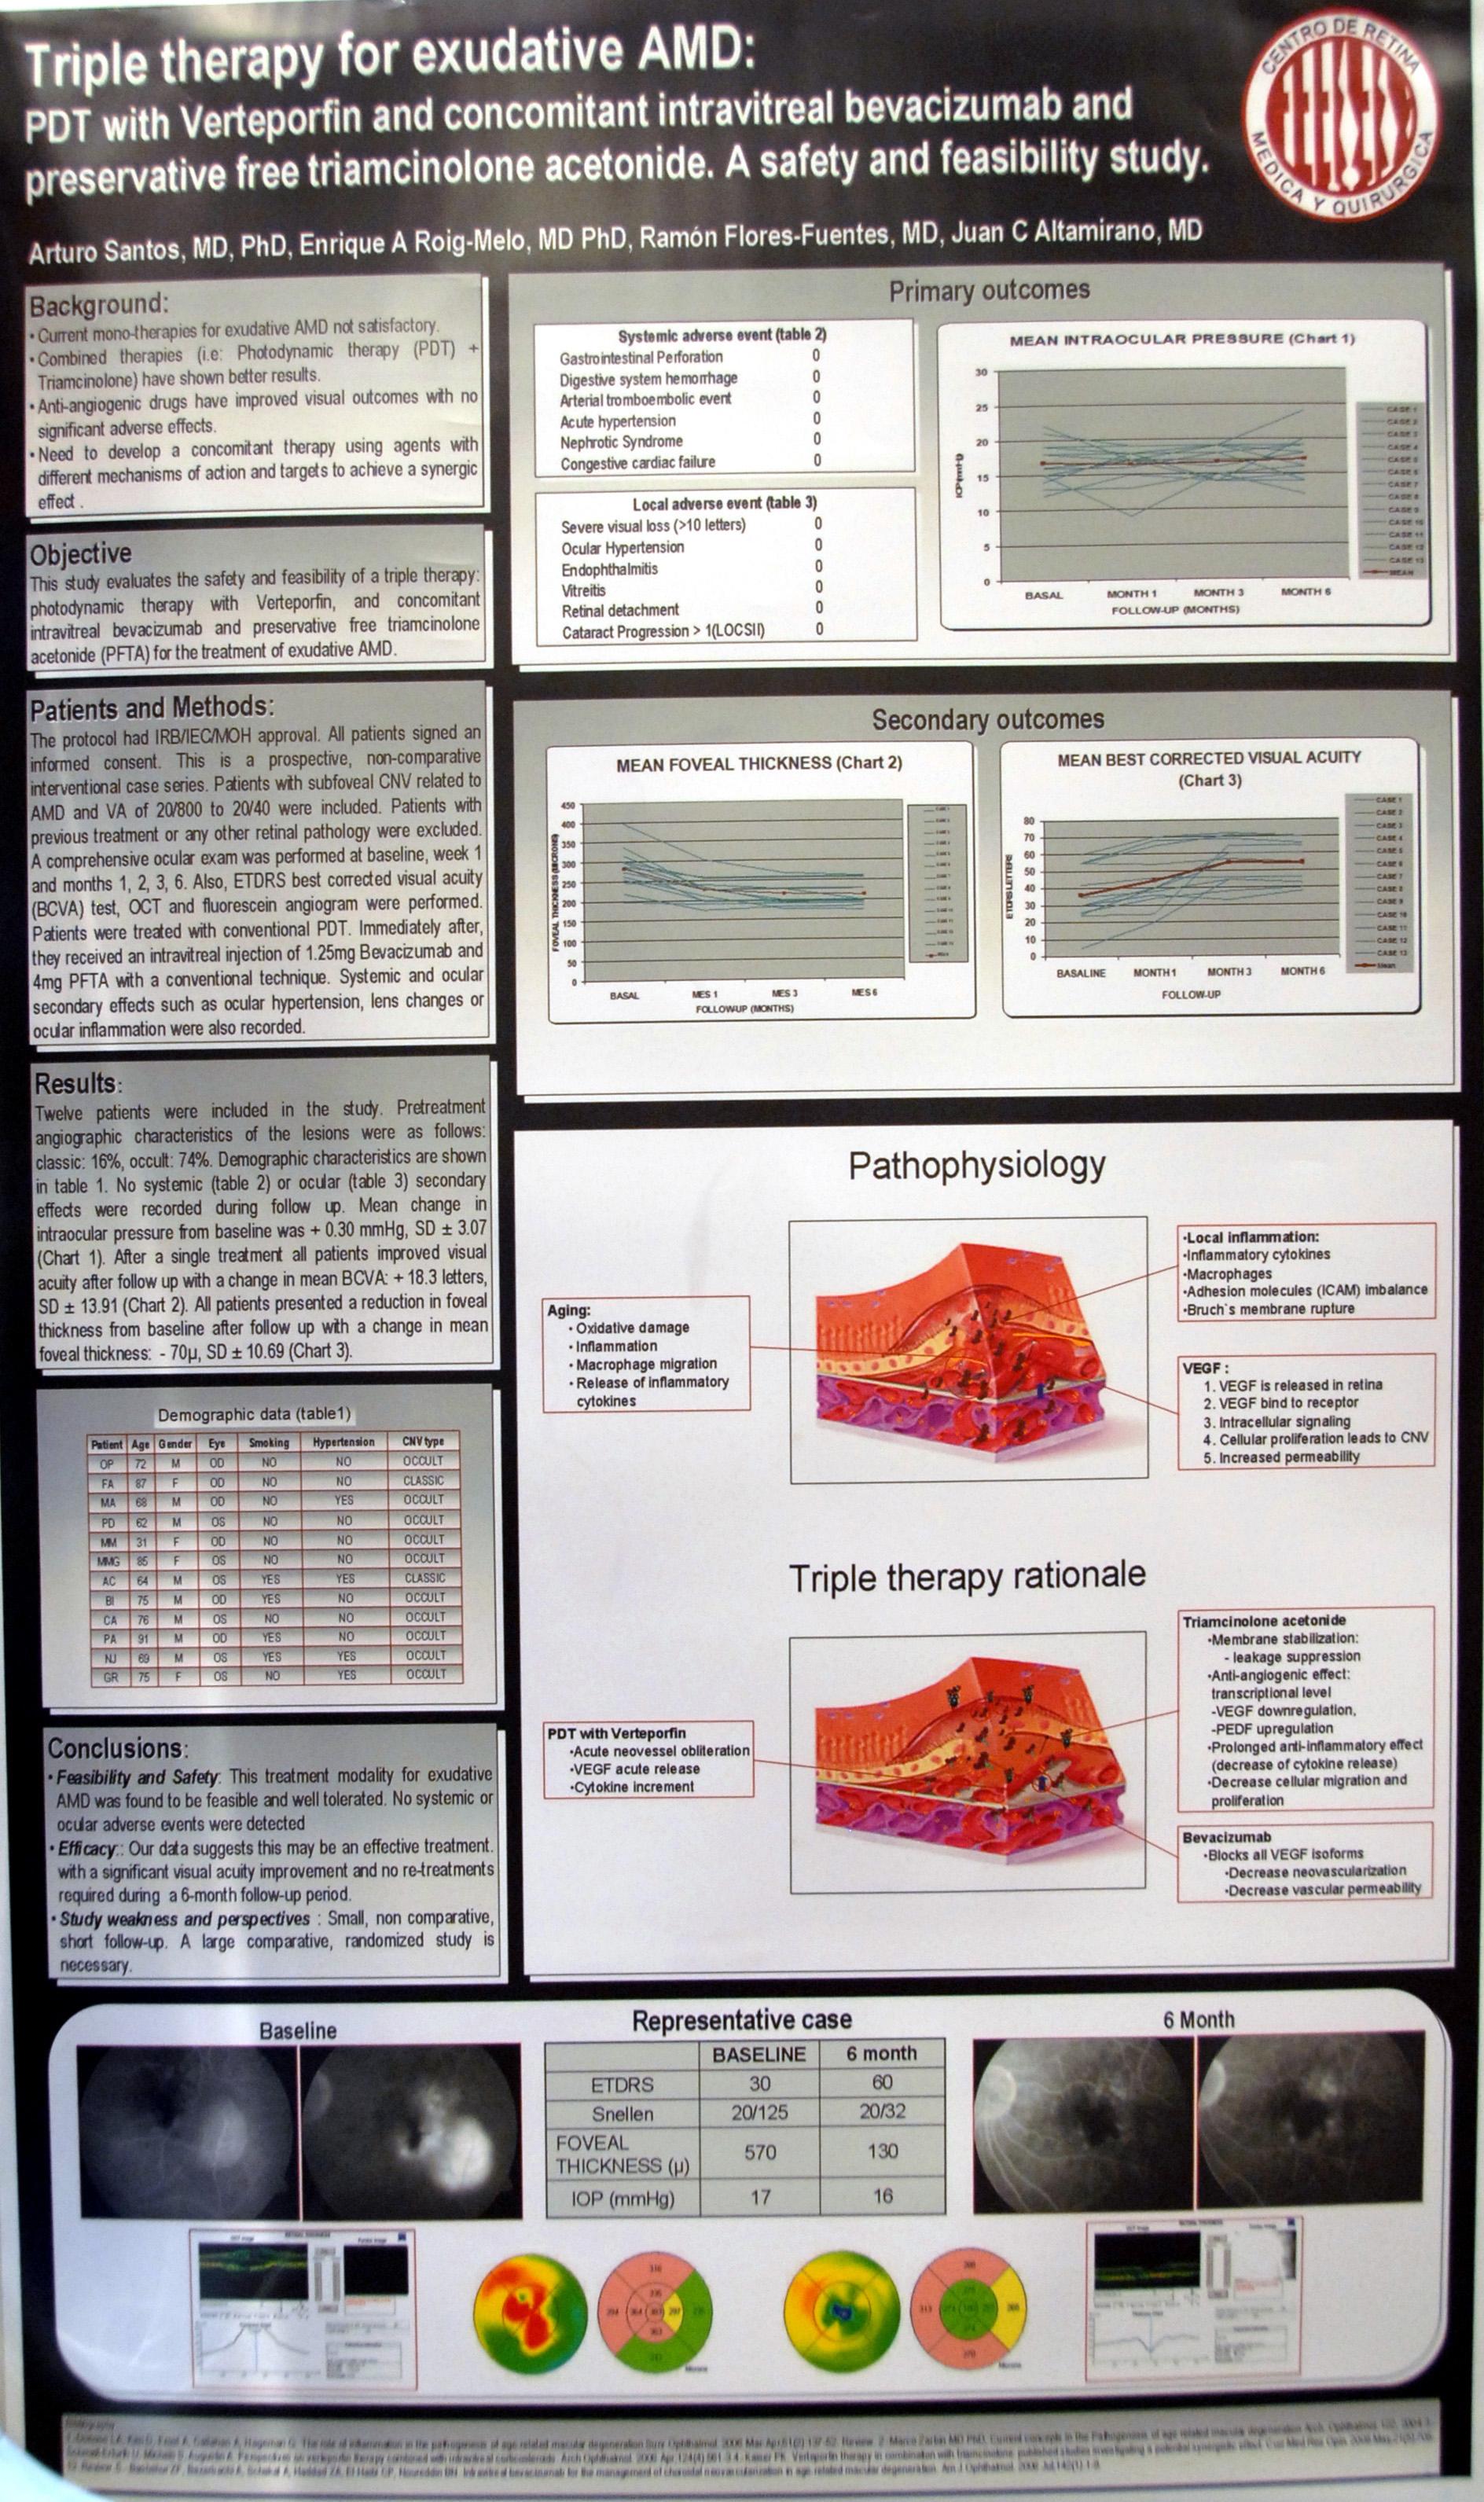 triamcinolone preservative free